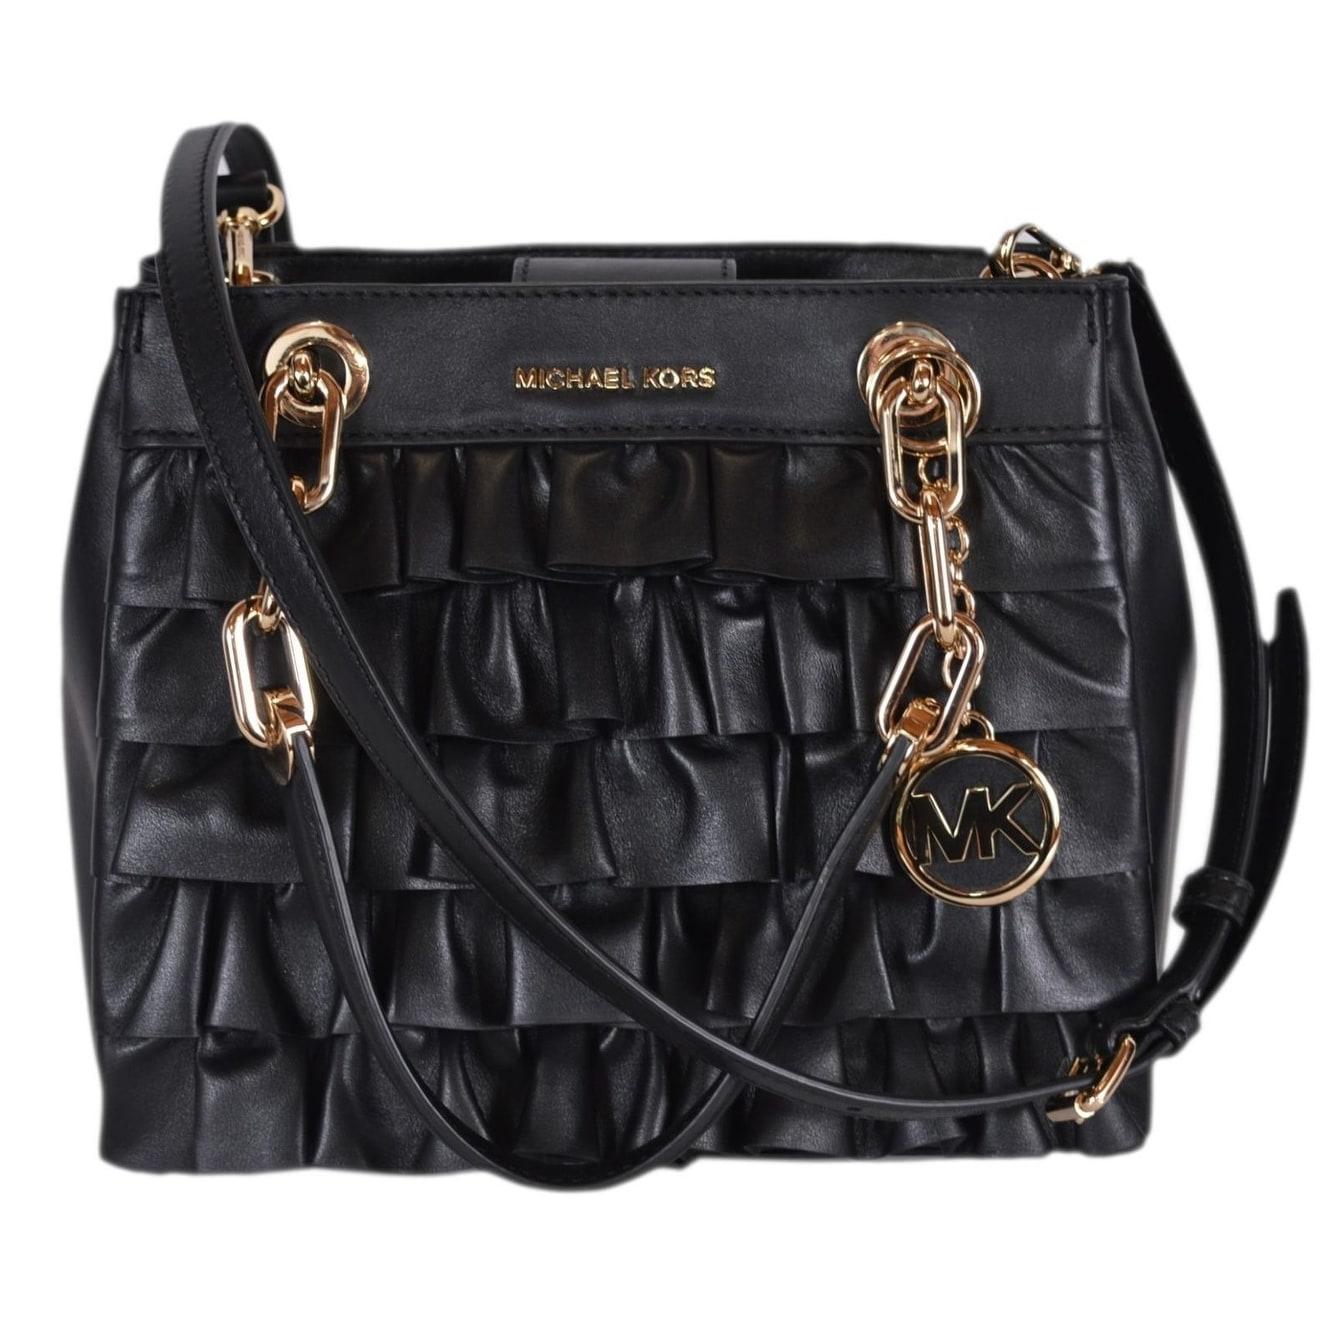 4d4114a2c4c9a8 ... netherlands shop michael kors small black leather ruffled cynthia satchel  purse handbag on sale free shipping